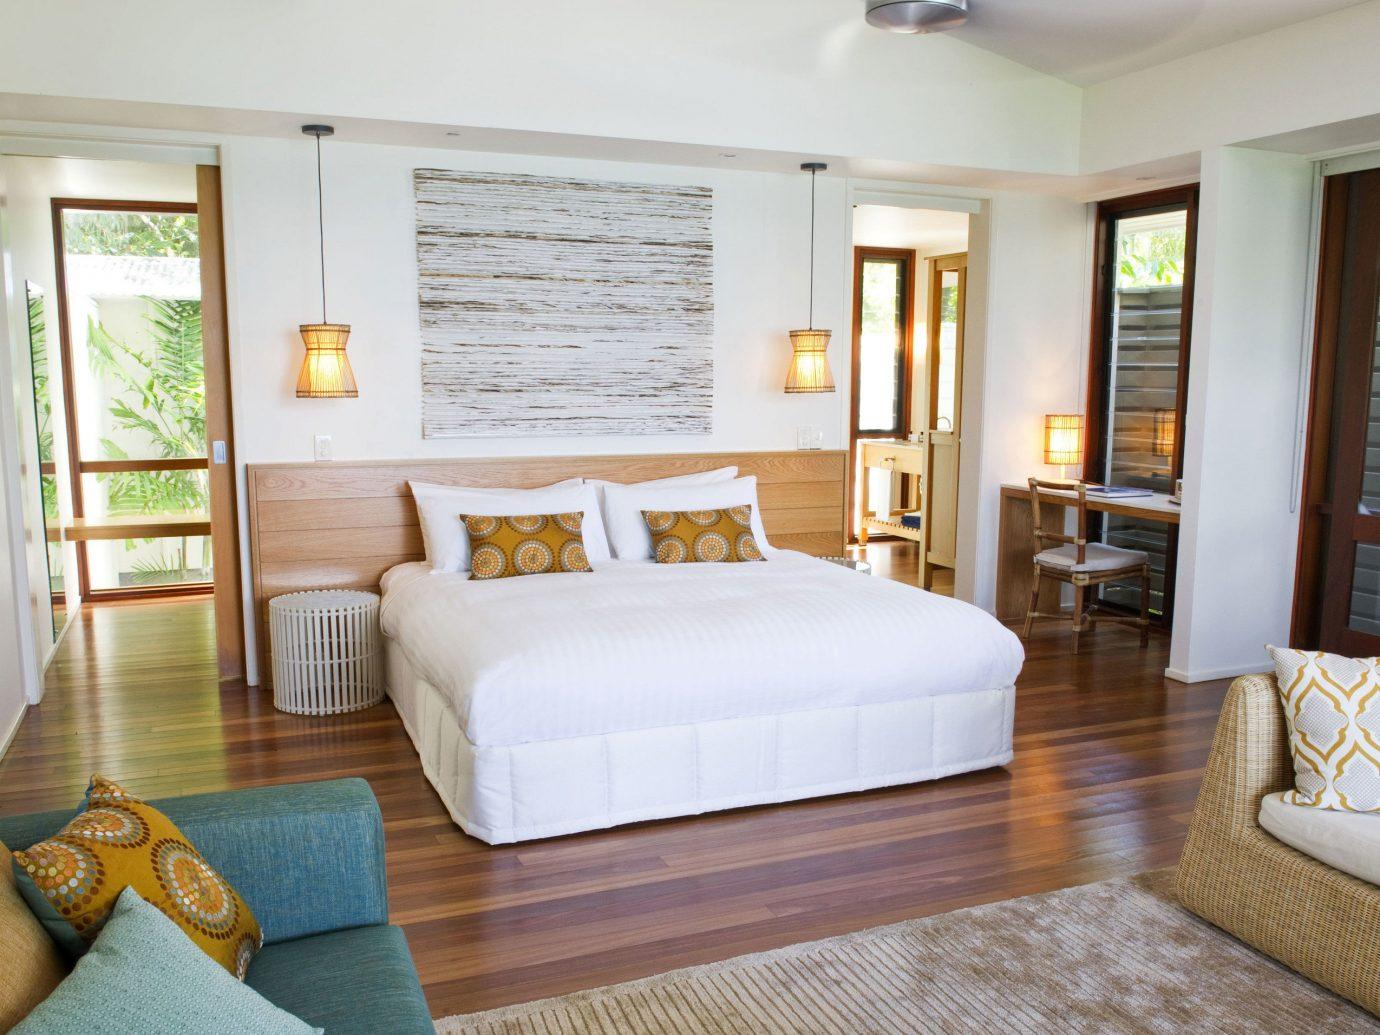 sofa property Bedroom Suite home condominium cottage living room nice Villa flat